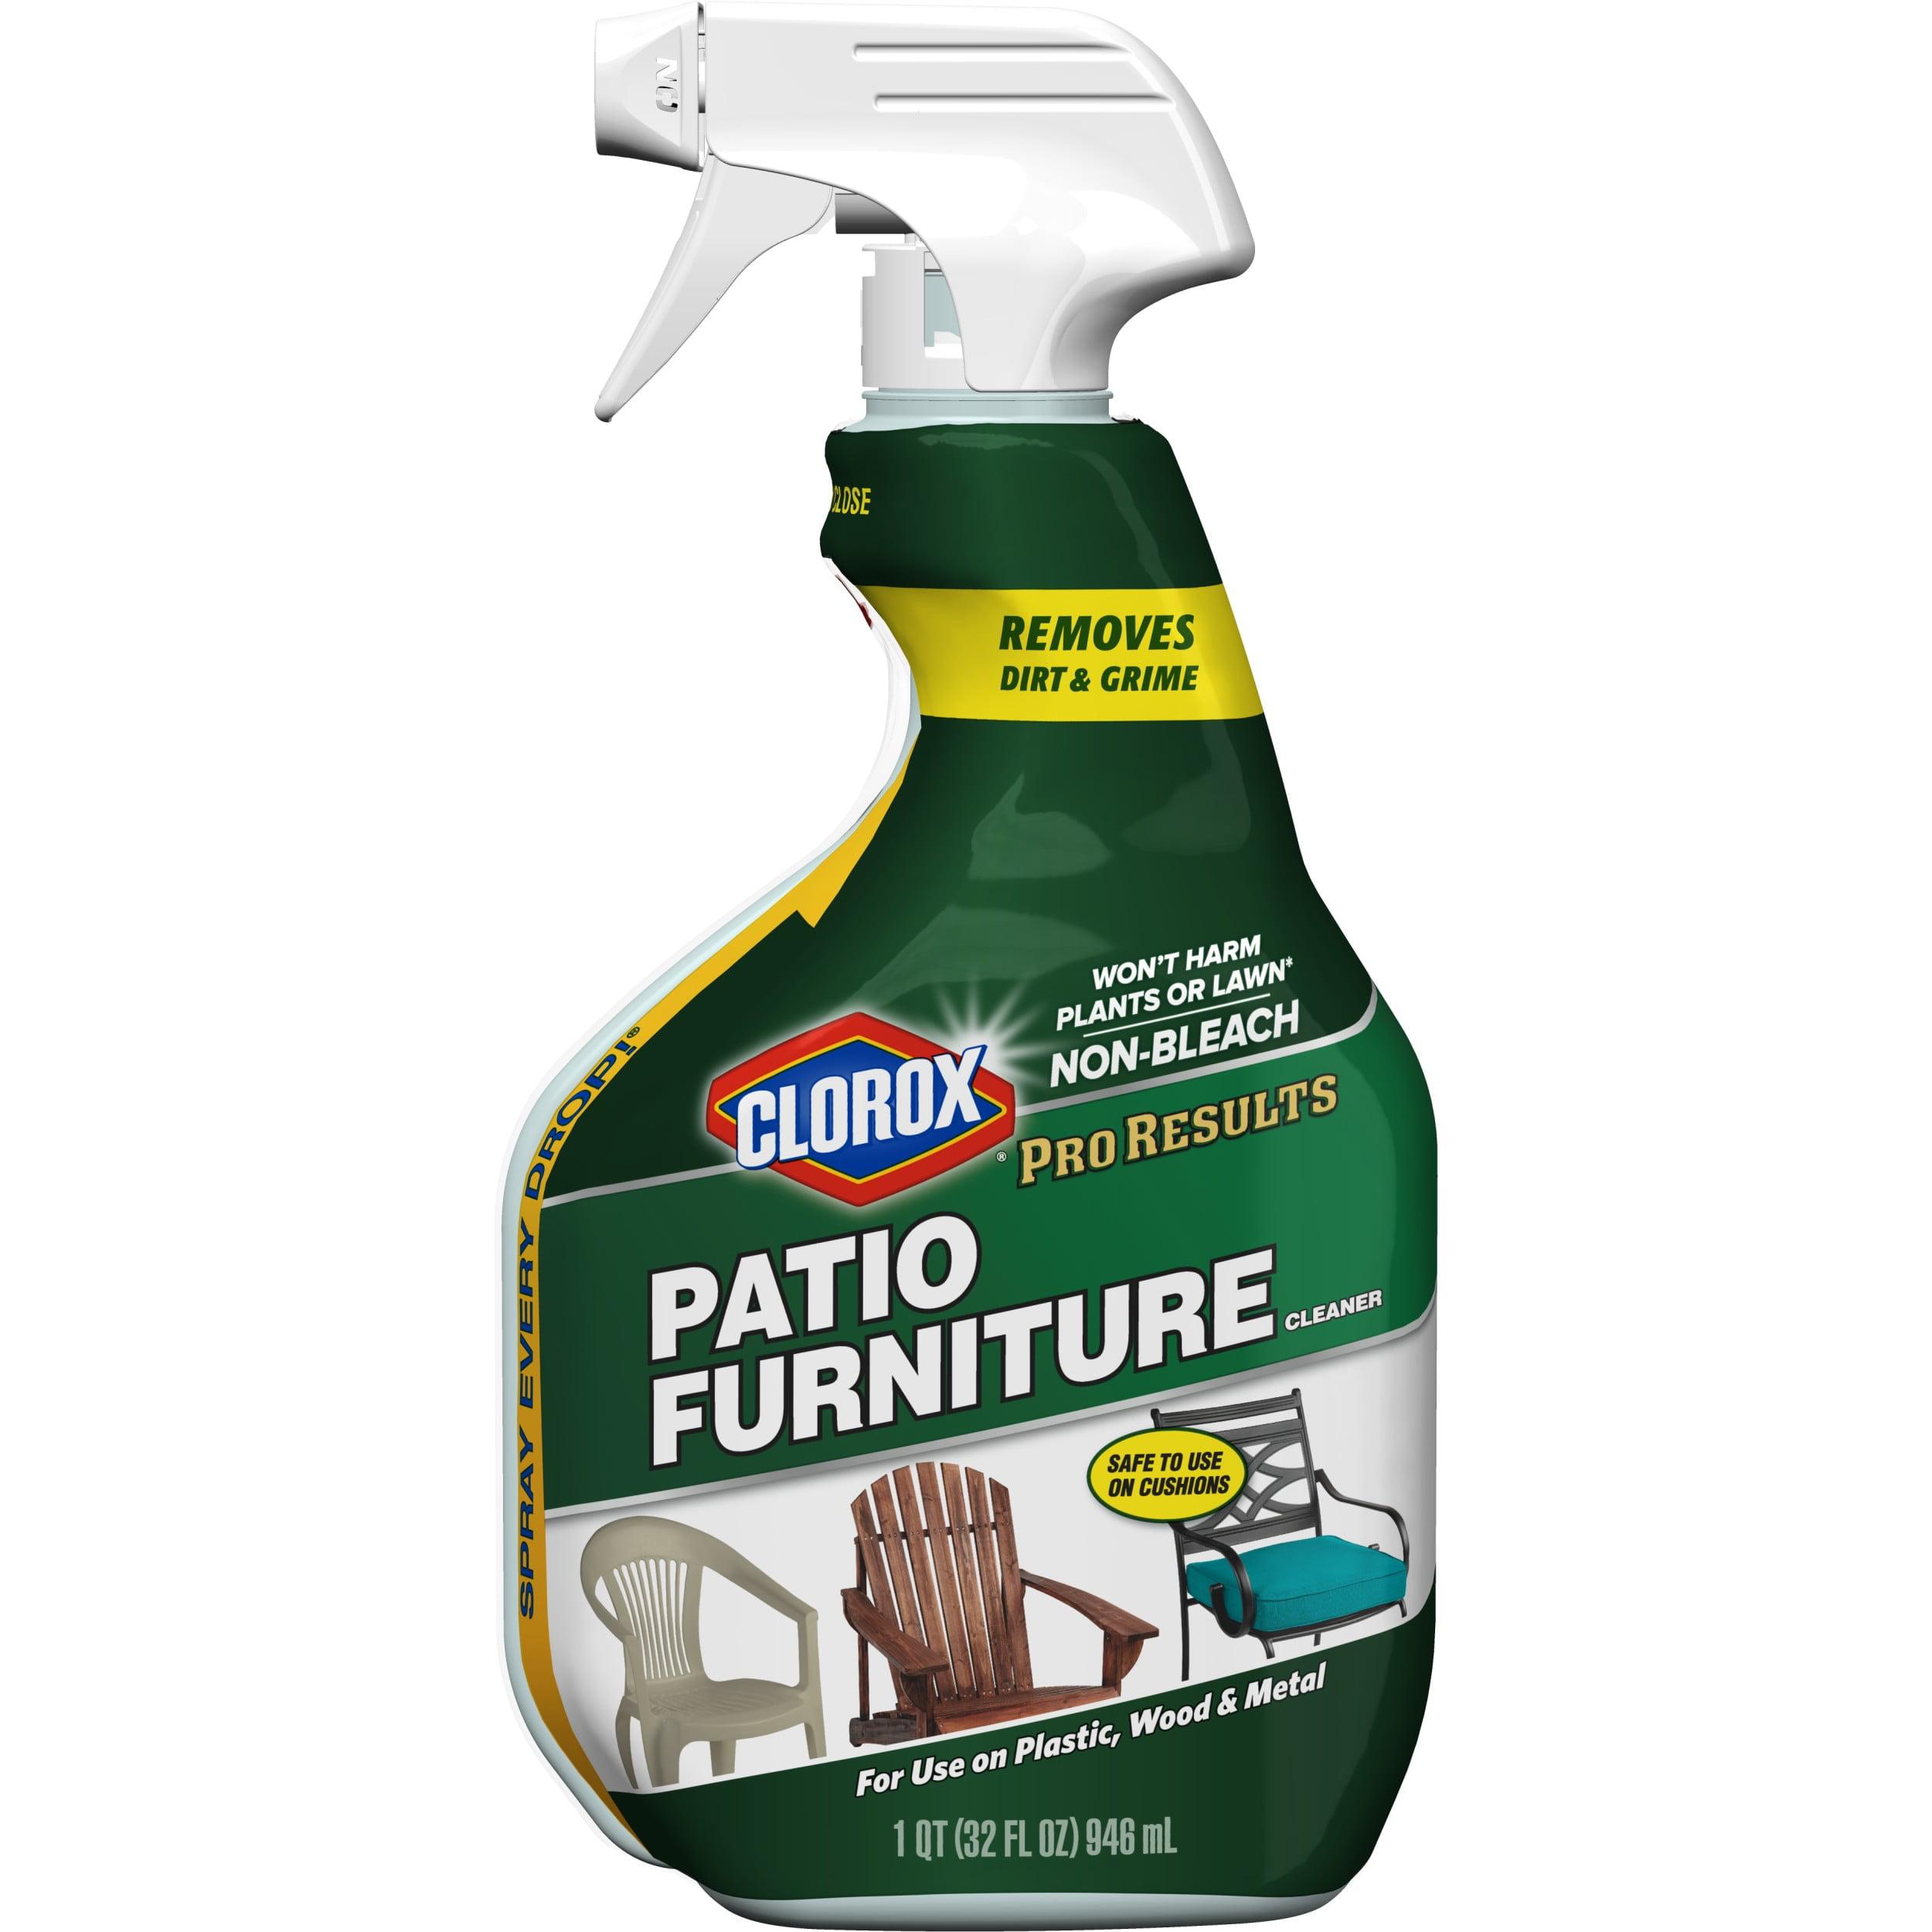 Clorox Pro Results Patio Furniture Cleaner, 10 oz - Walmart.com